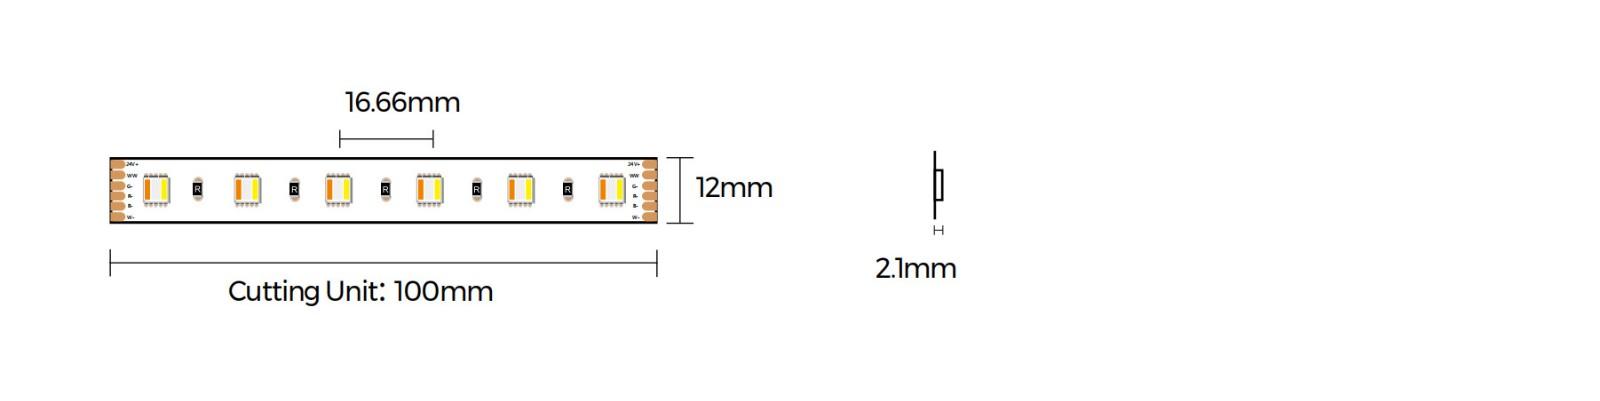 D560RGBLWW-24V-12mm